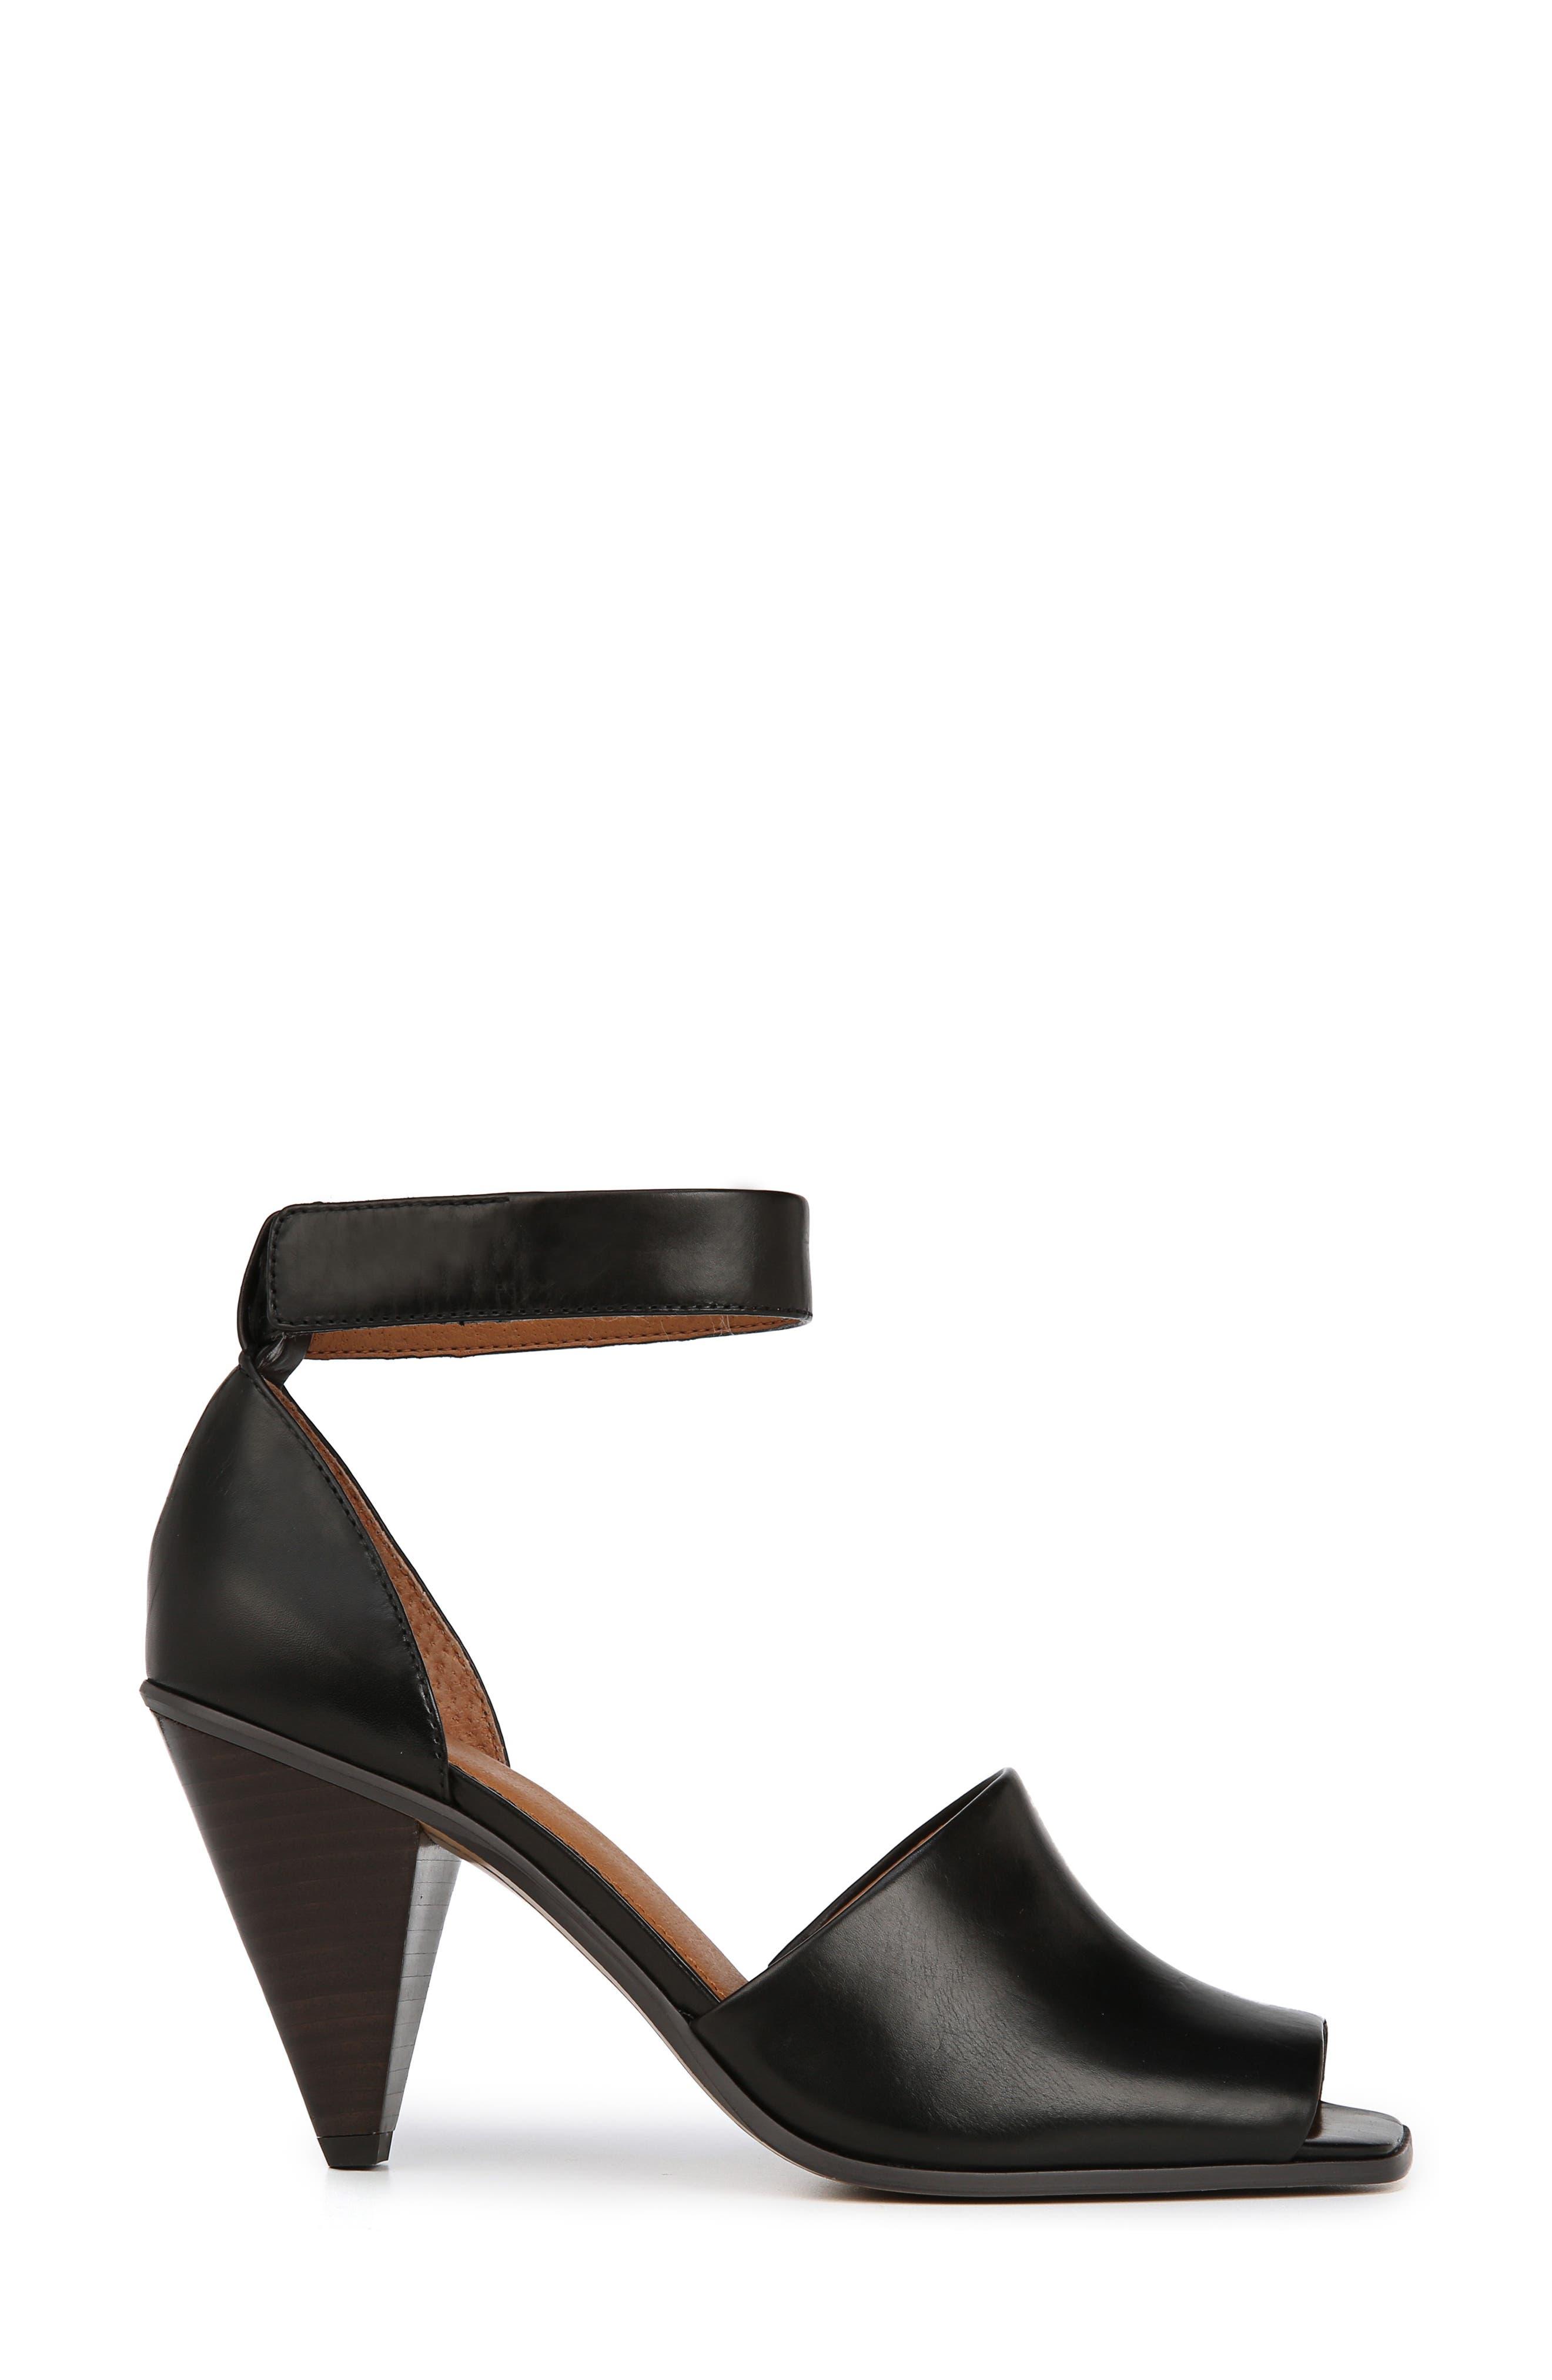 SARTO BY FRANCO SARTO, Ankle Strap Sandal, Alternate thumbnail 3, color, BLACK FOULARD LEATHER